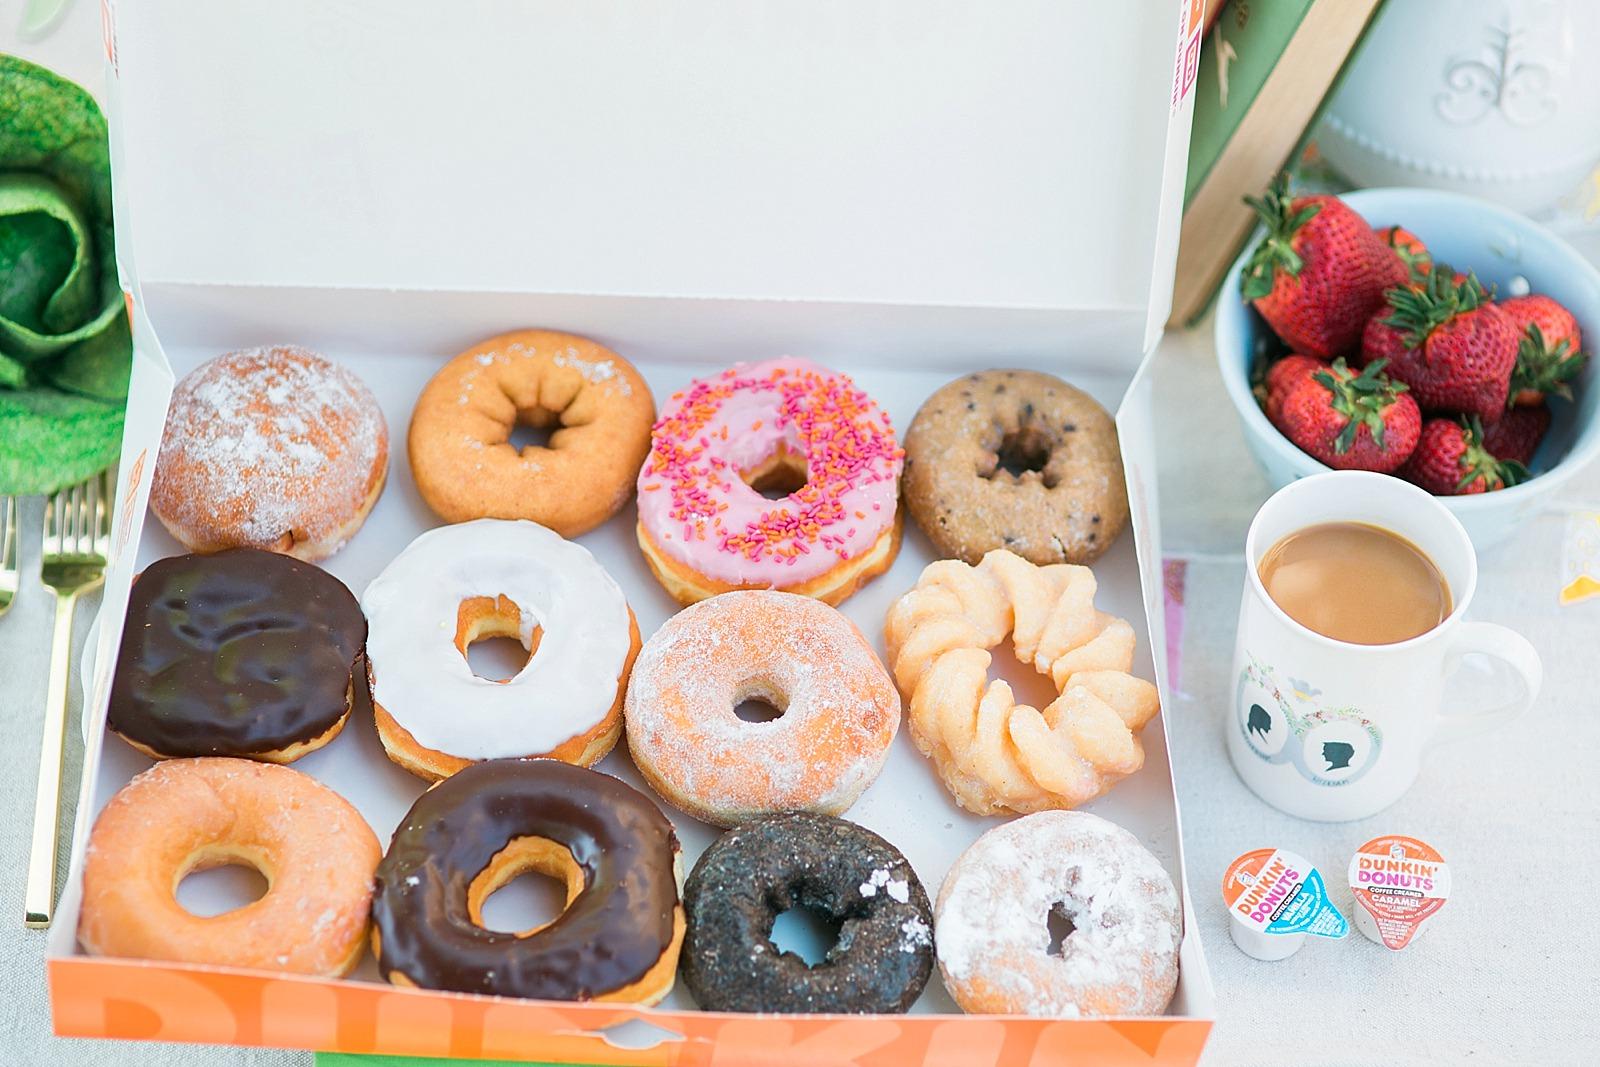 diana-elizabeth-blog-lifestyle-dunkin-creamers-dunkin-donuts-brunch-book-club--4613